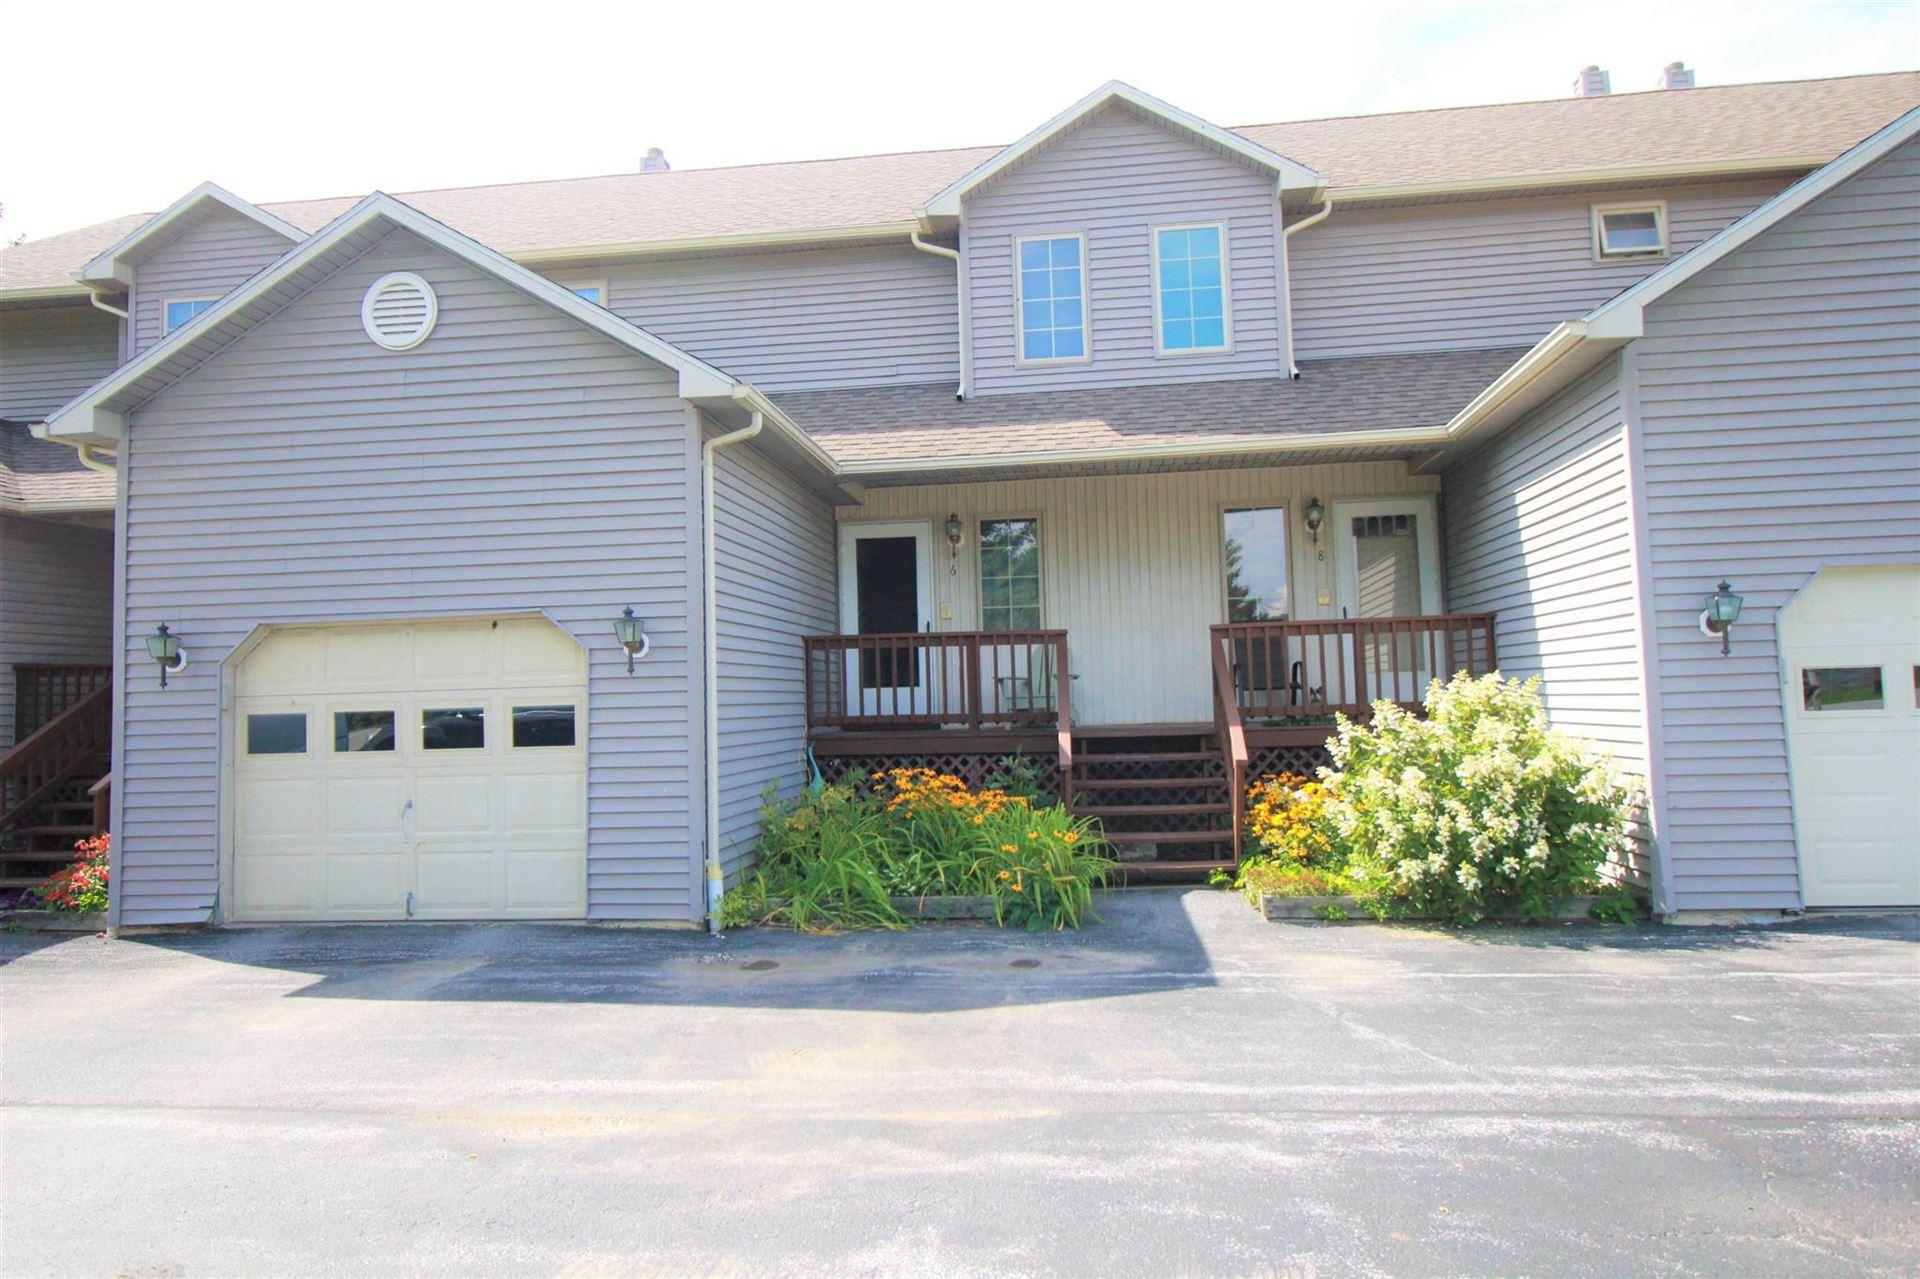 6 Green Mountain Drive, Saint Albans, VT 05478 - MLS#: 4822864